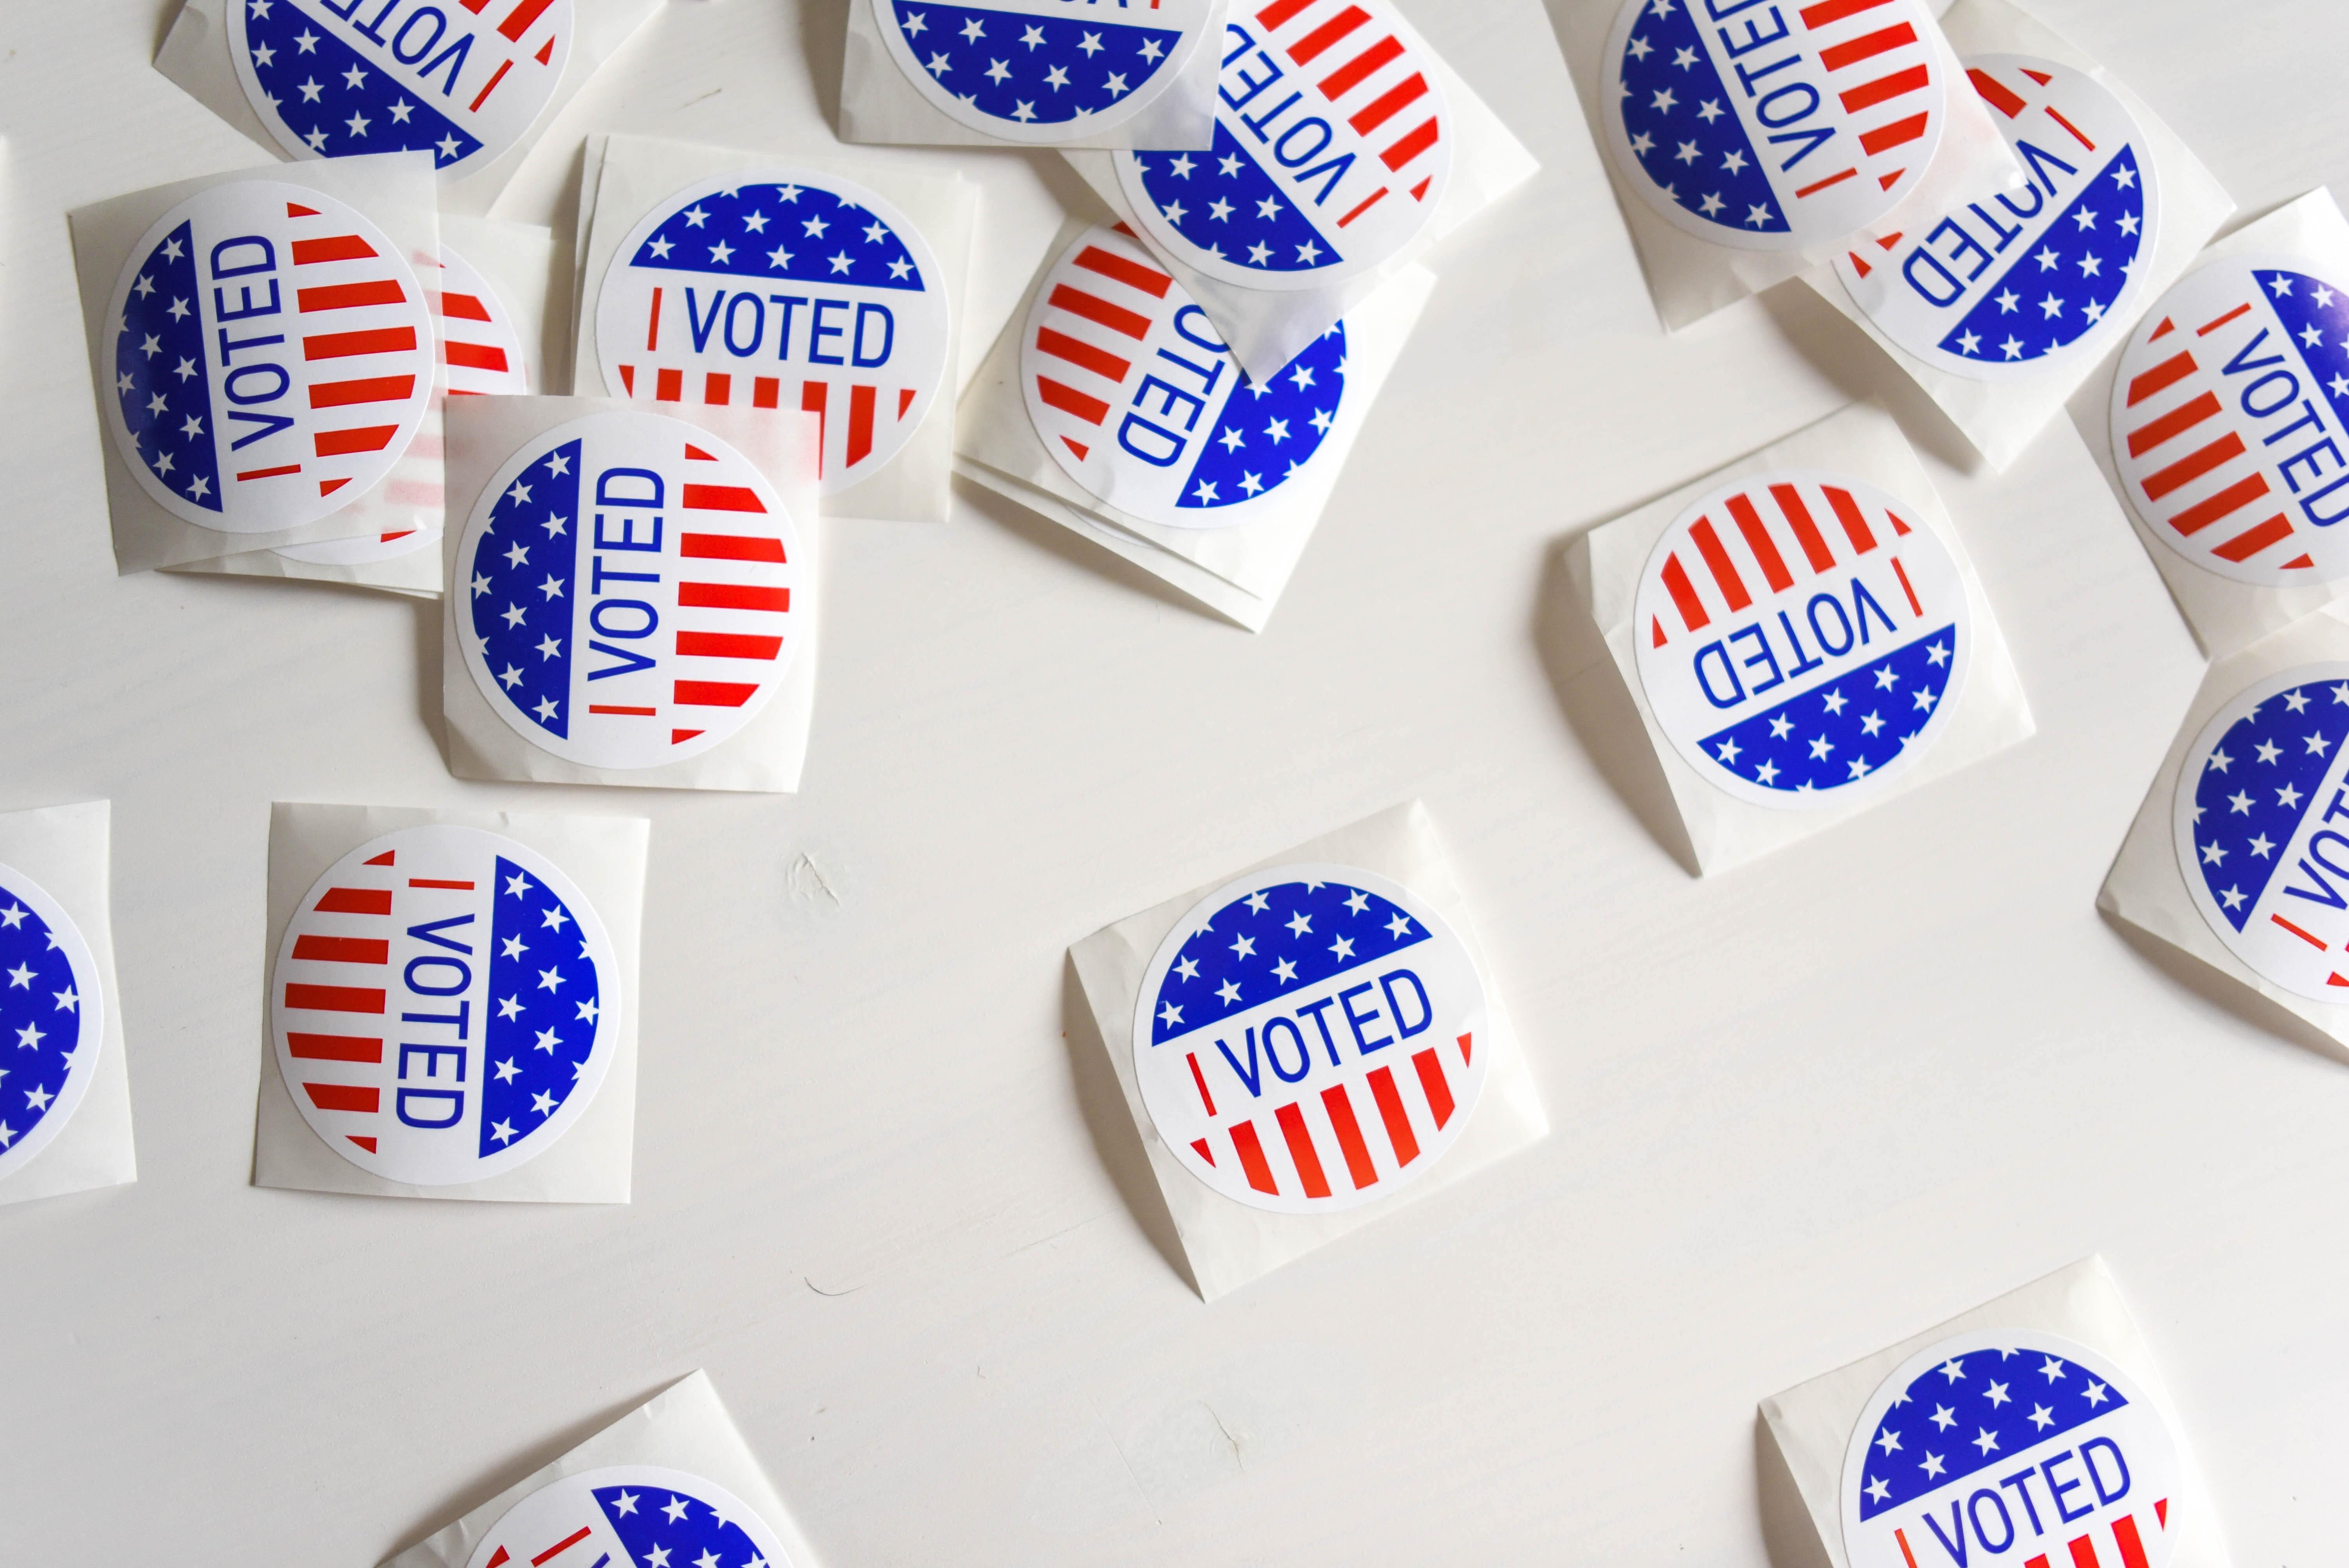 I voted GWI USA